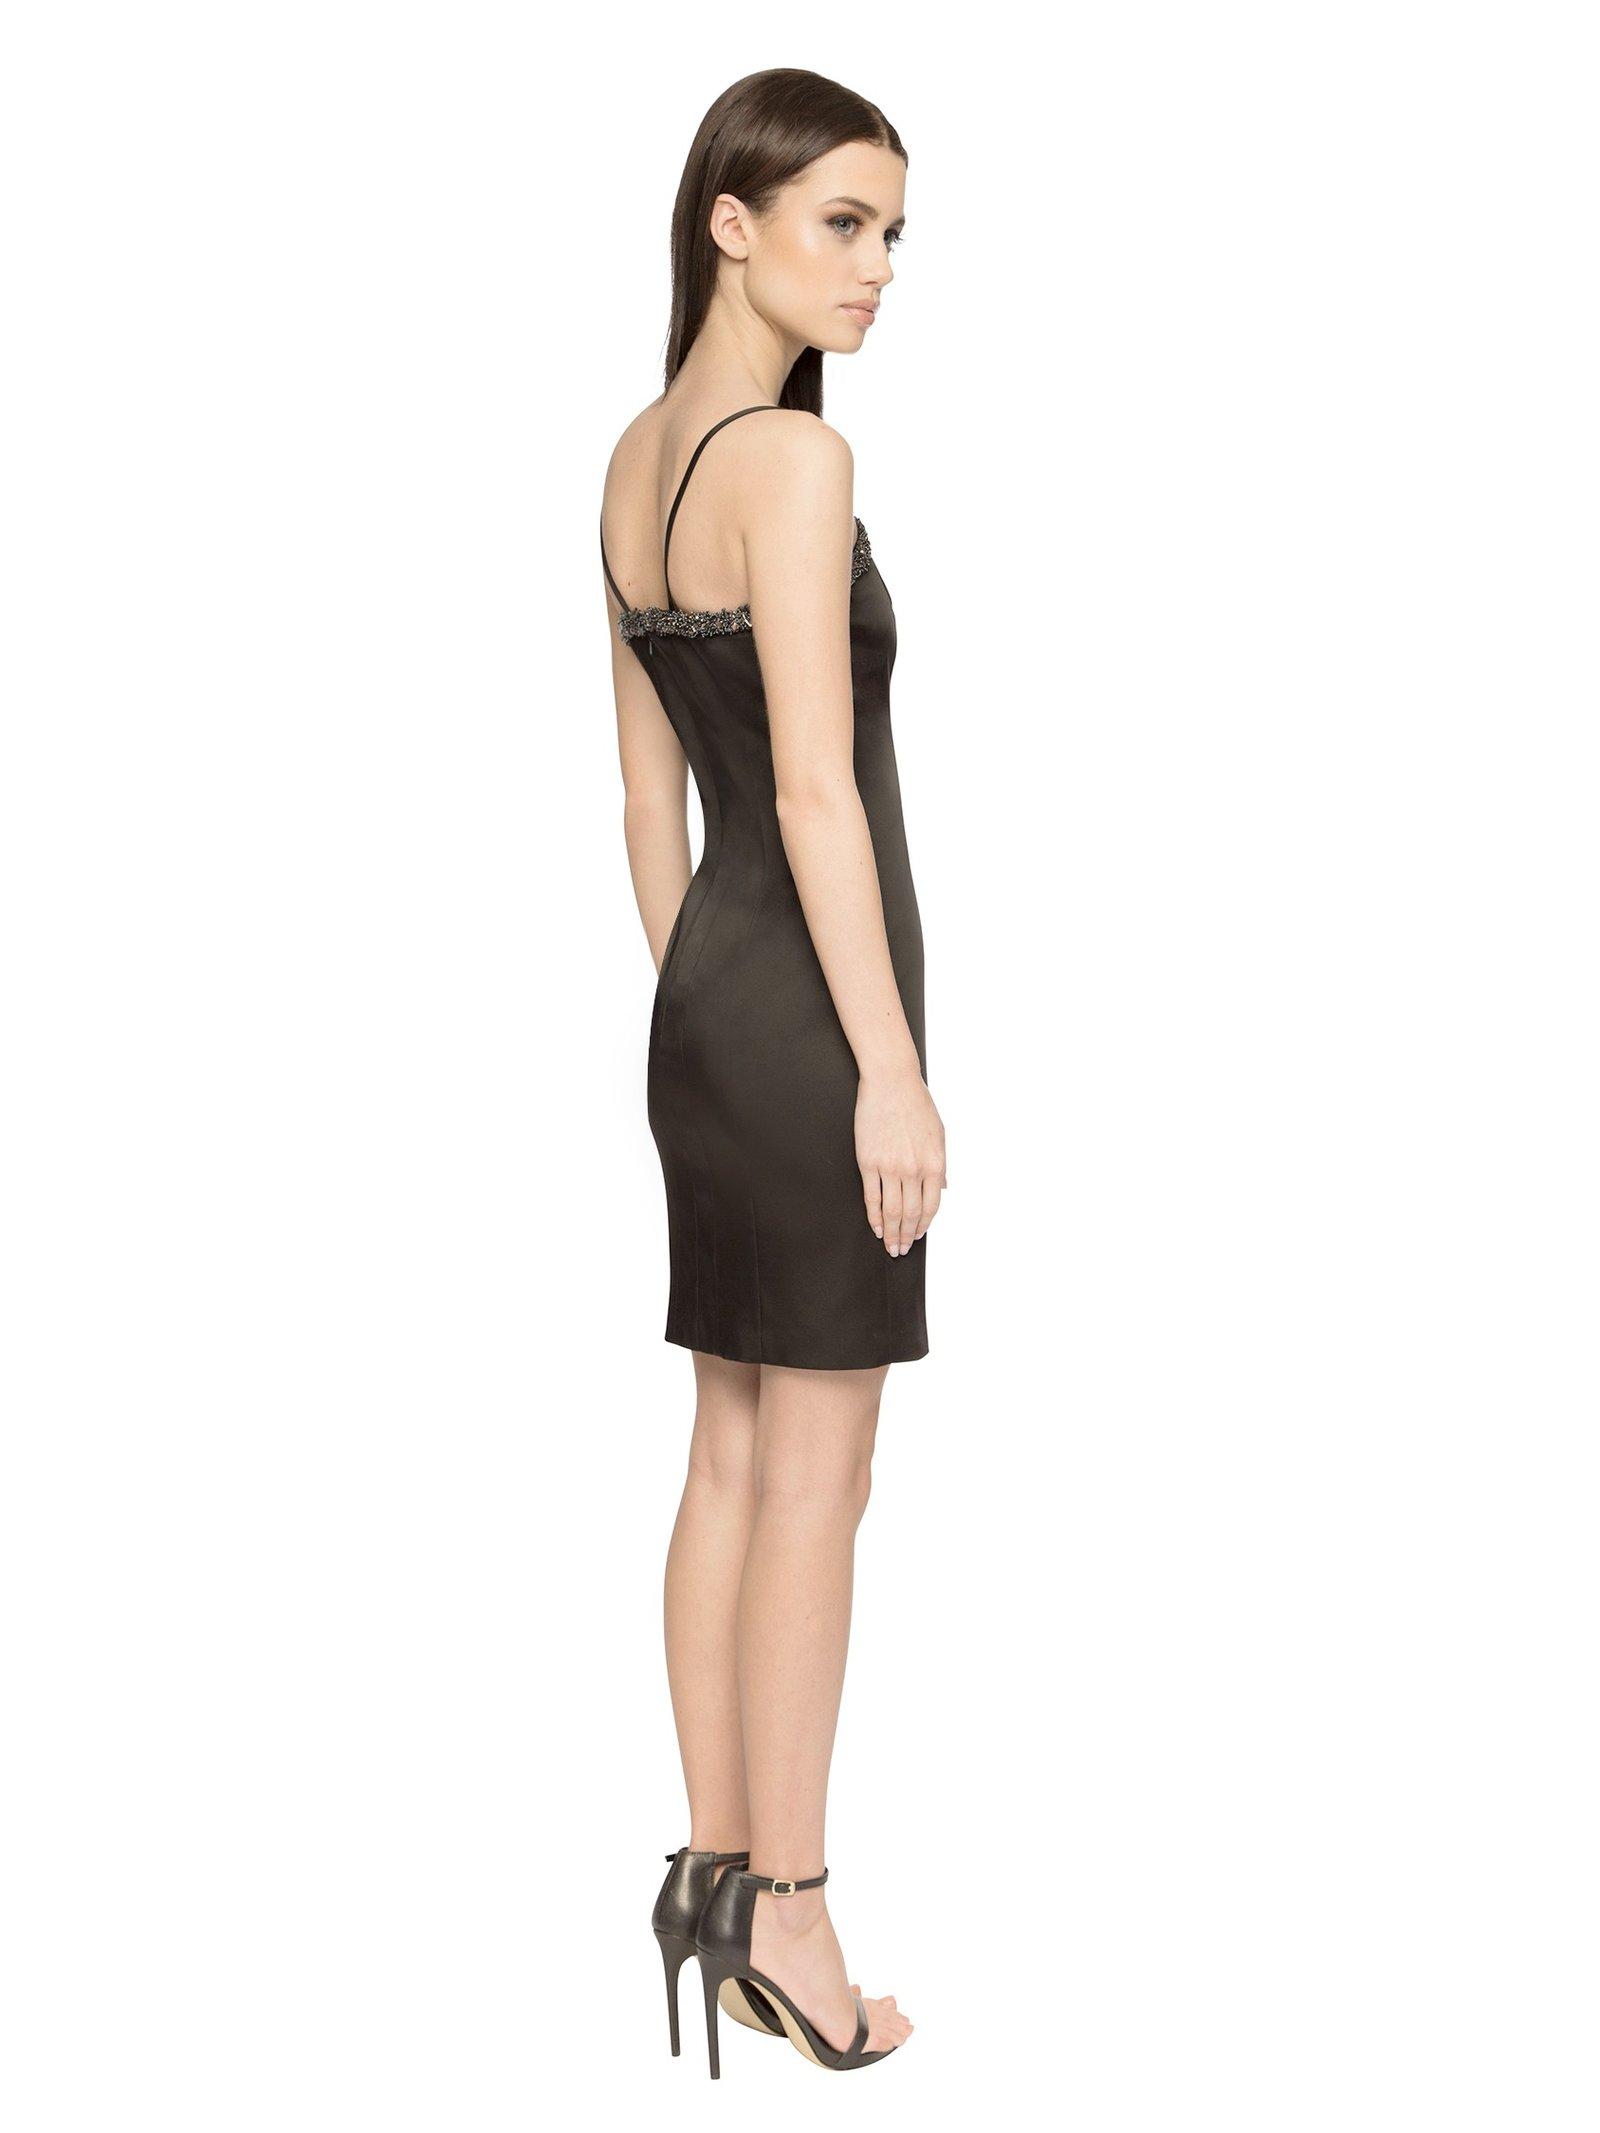 Aloura London Lillie Dress - Black